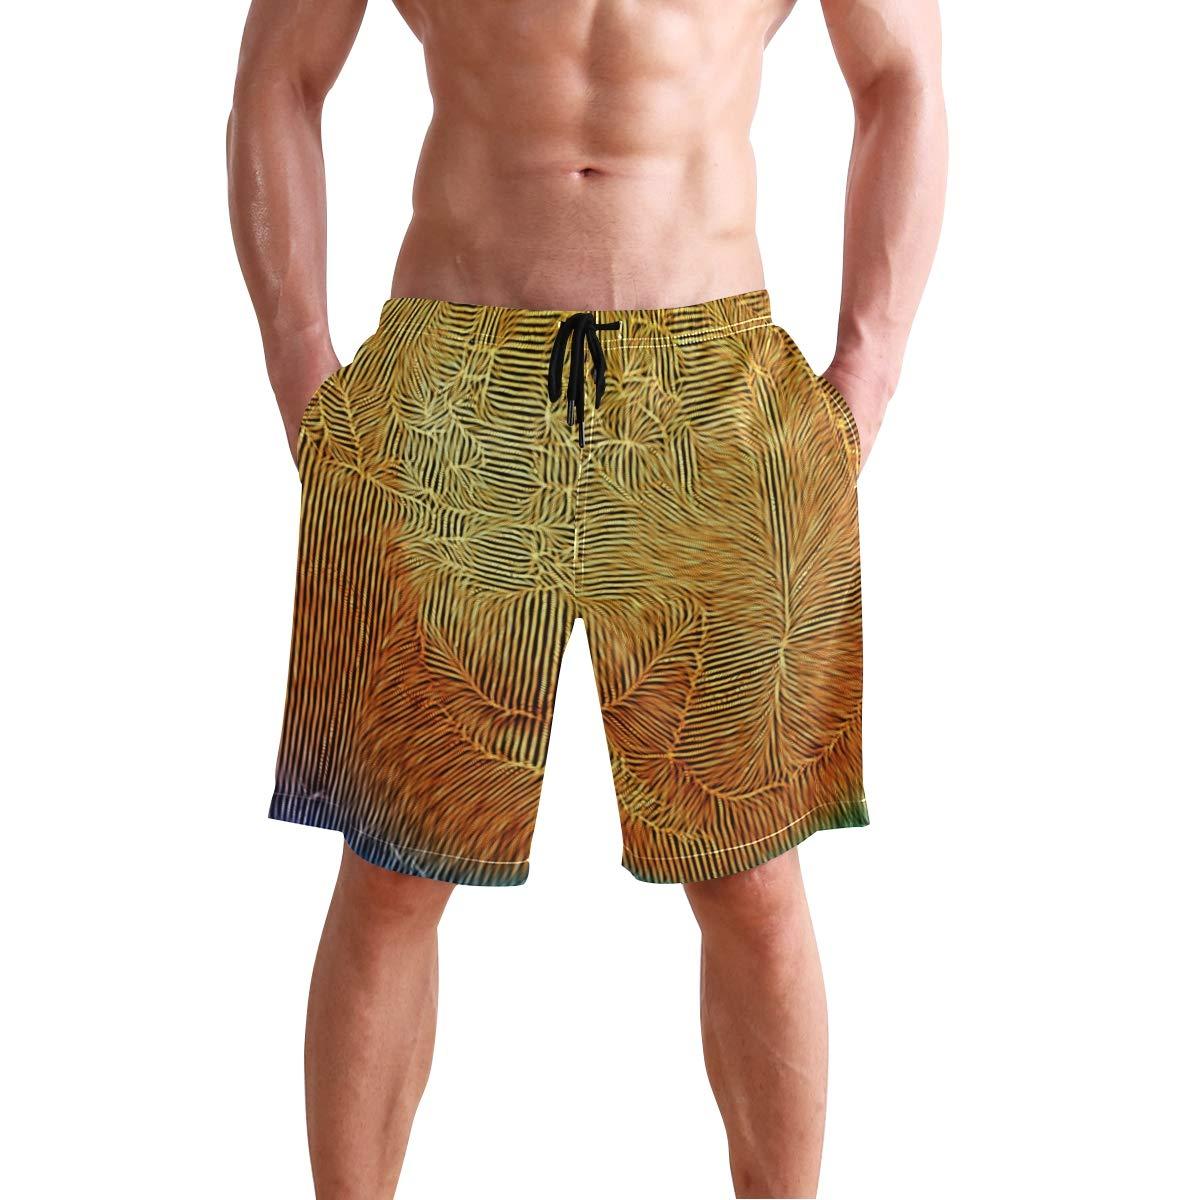 DJROW Paisley Pattern Mens Quick Dry Beach Shorts Swim Trunk Beachwear with Pockets